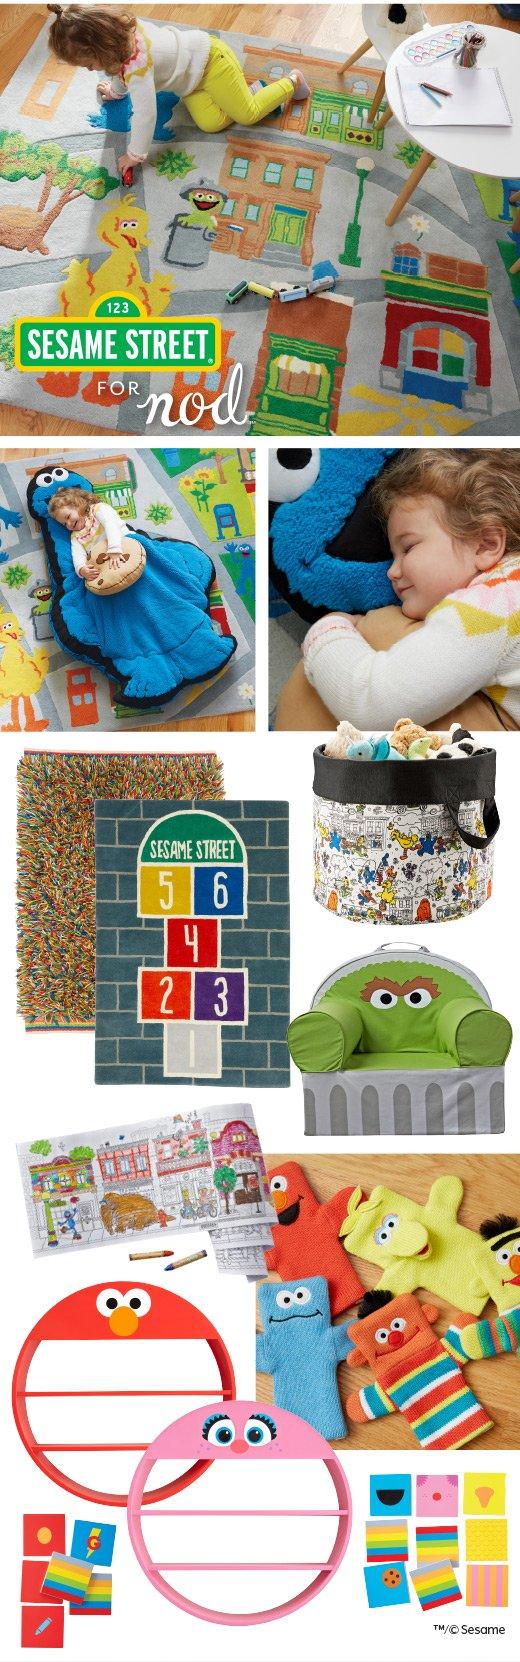 Shop Sesame Street For Nod